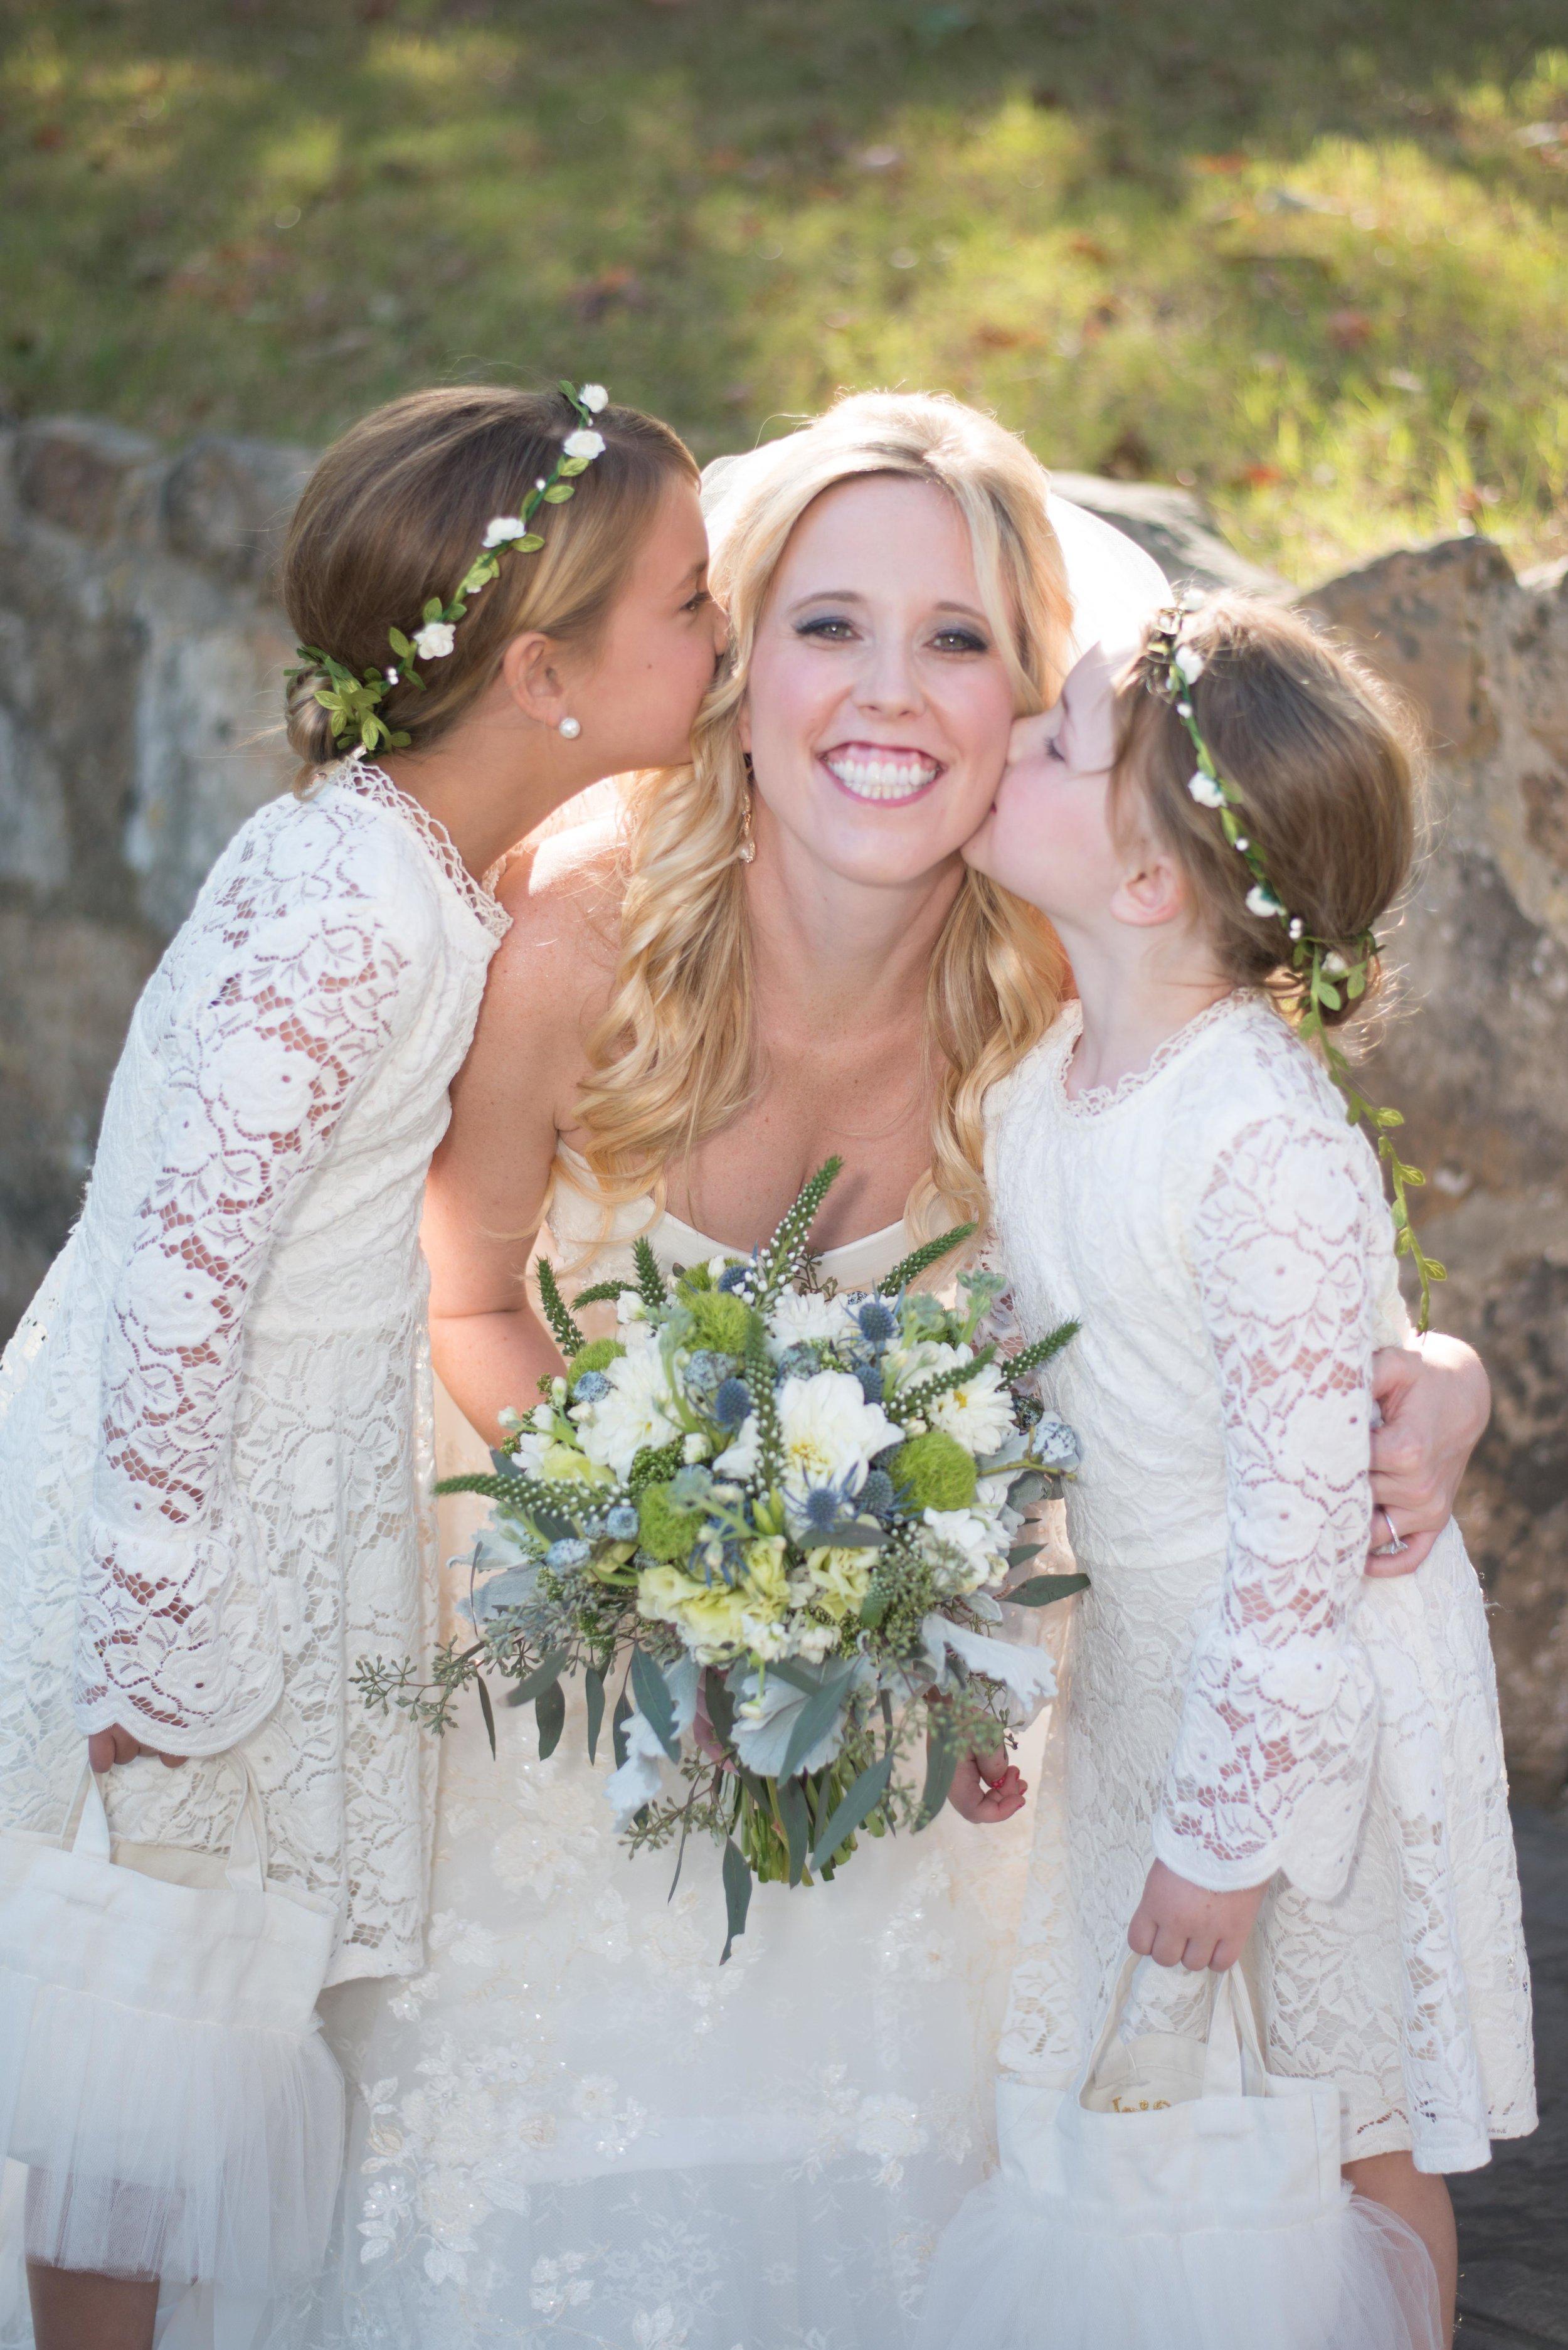 00001_Kuhnert-Wedding-24.jpg